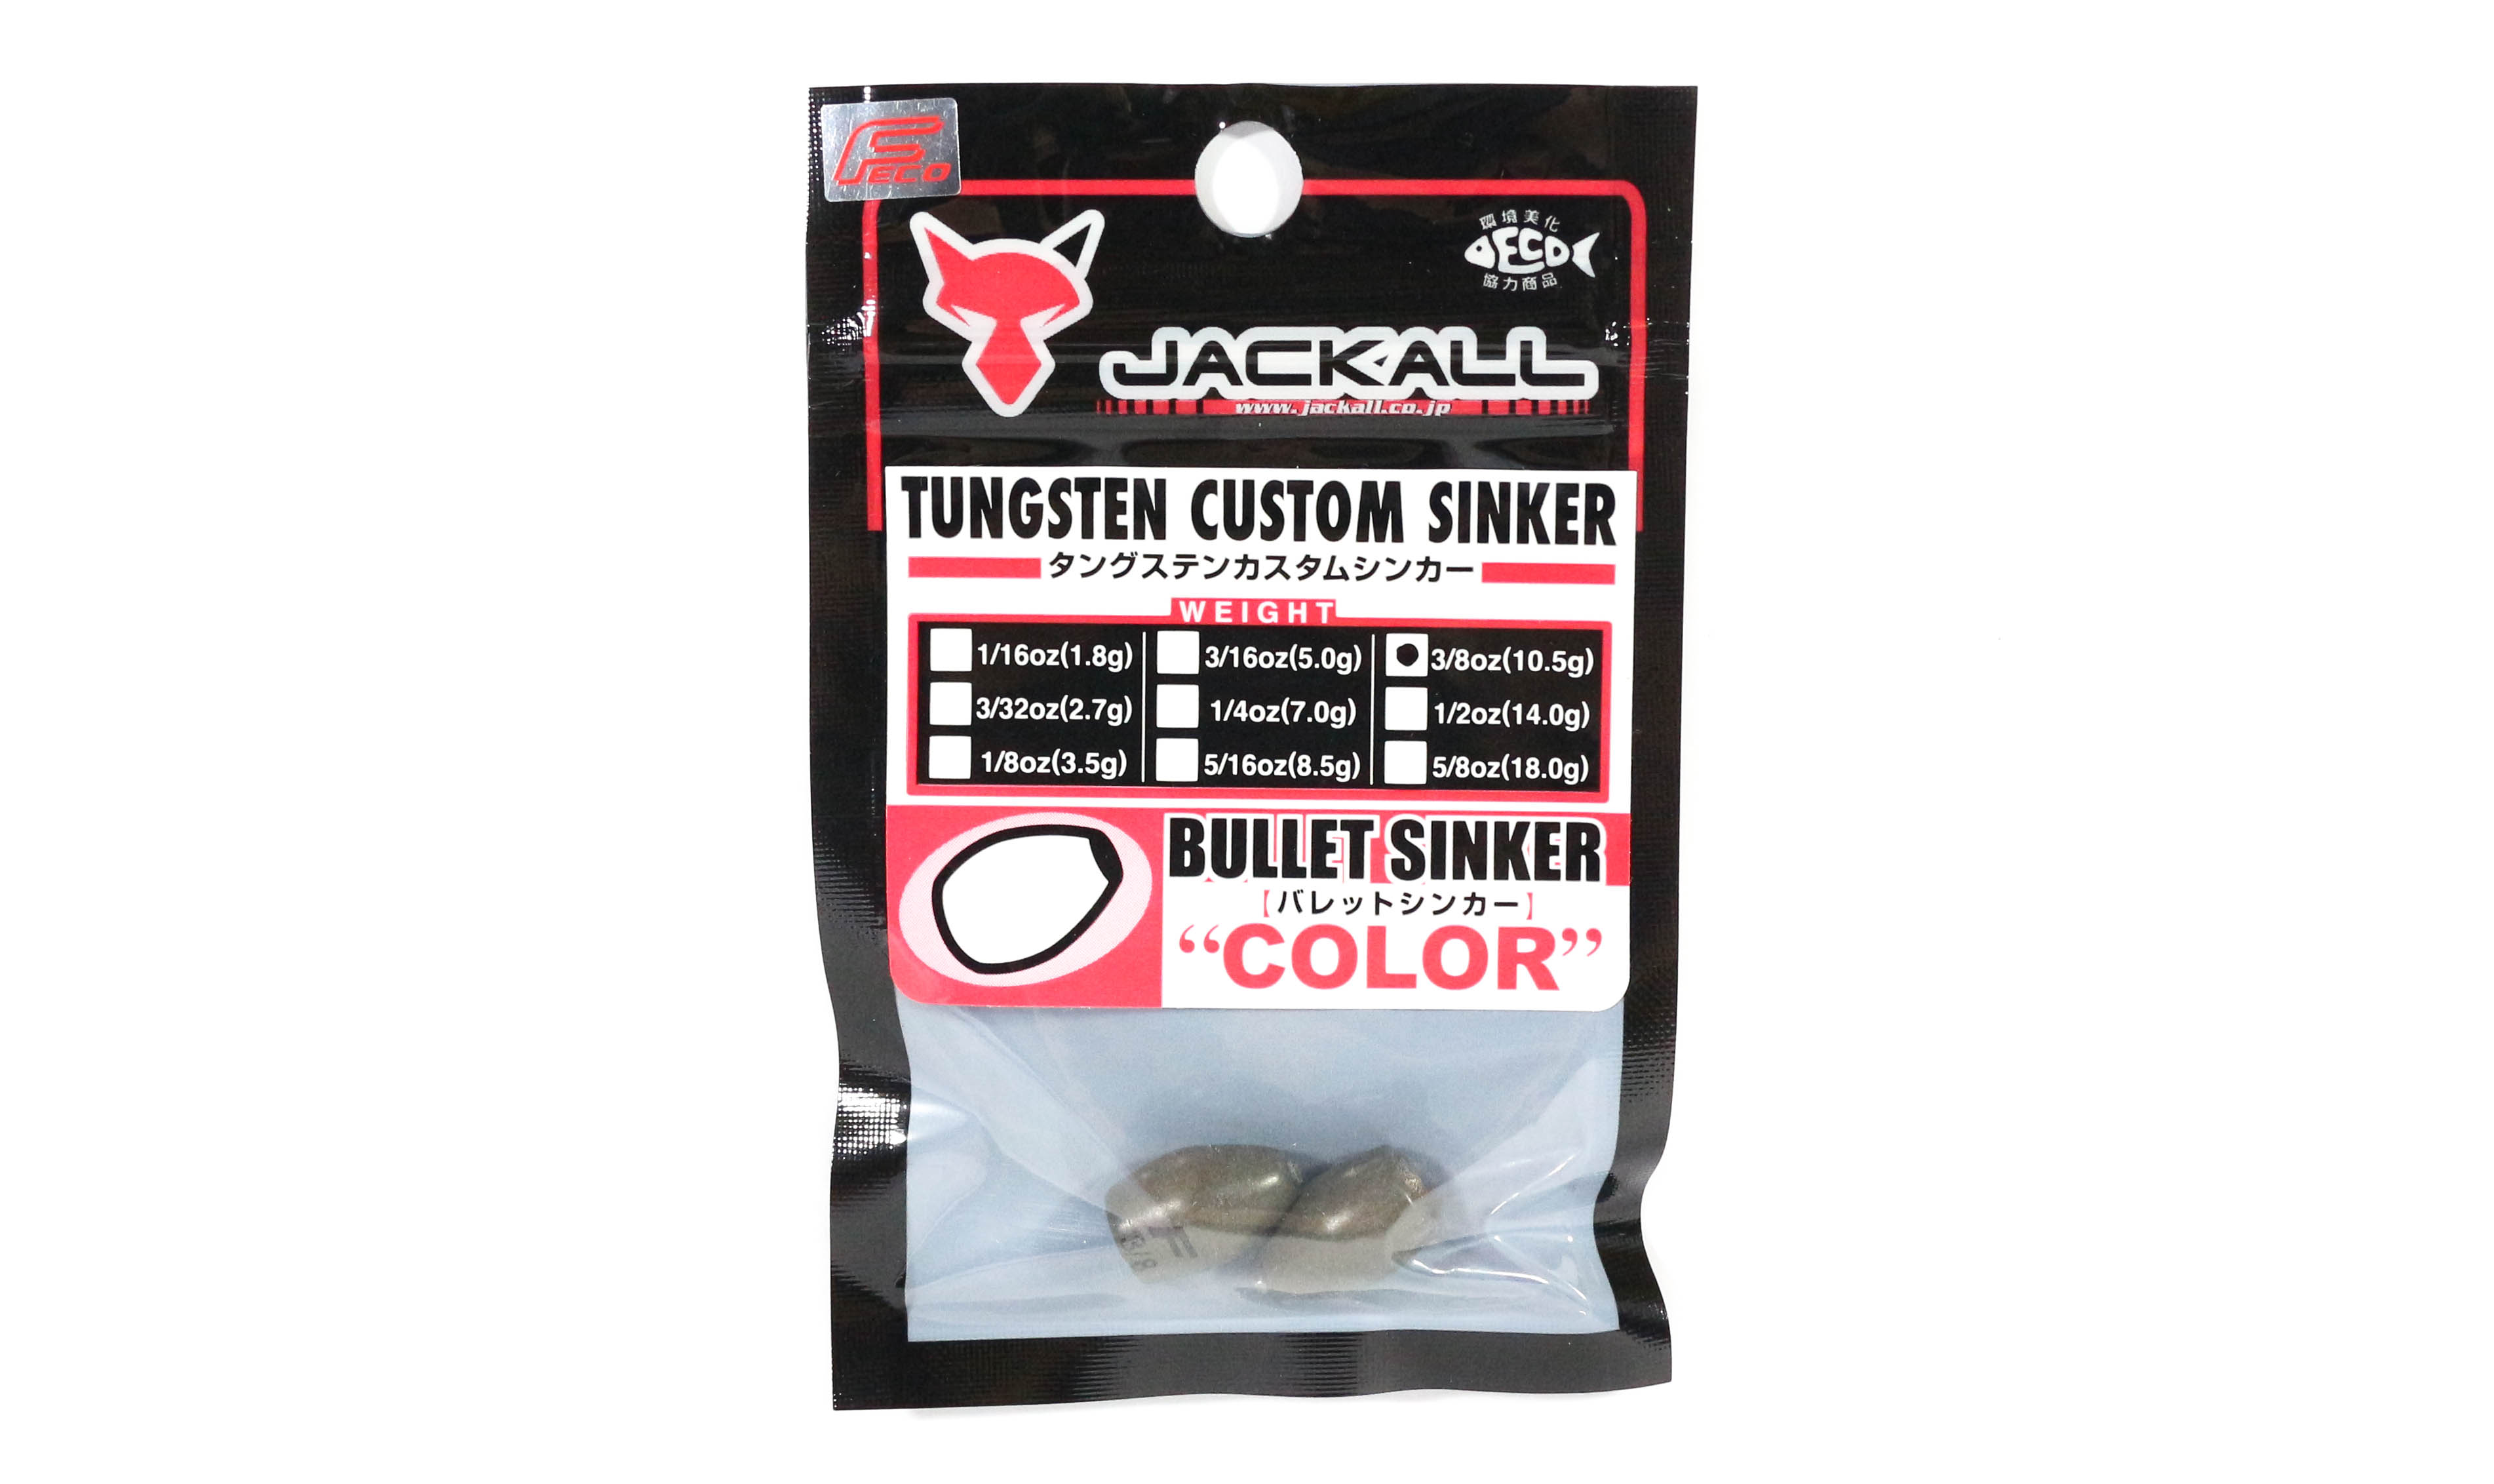 Jackall Tungsten Bullet Sinker Color 10.5 Grams - 2 Pcs Per Pack (5497)